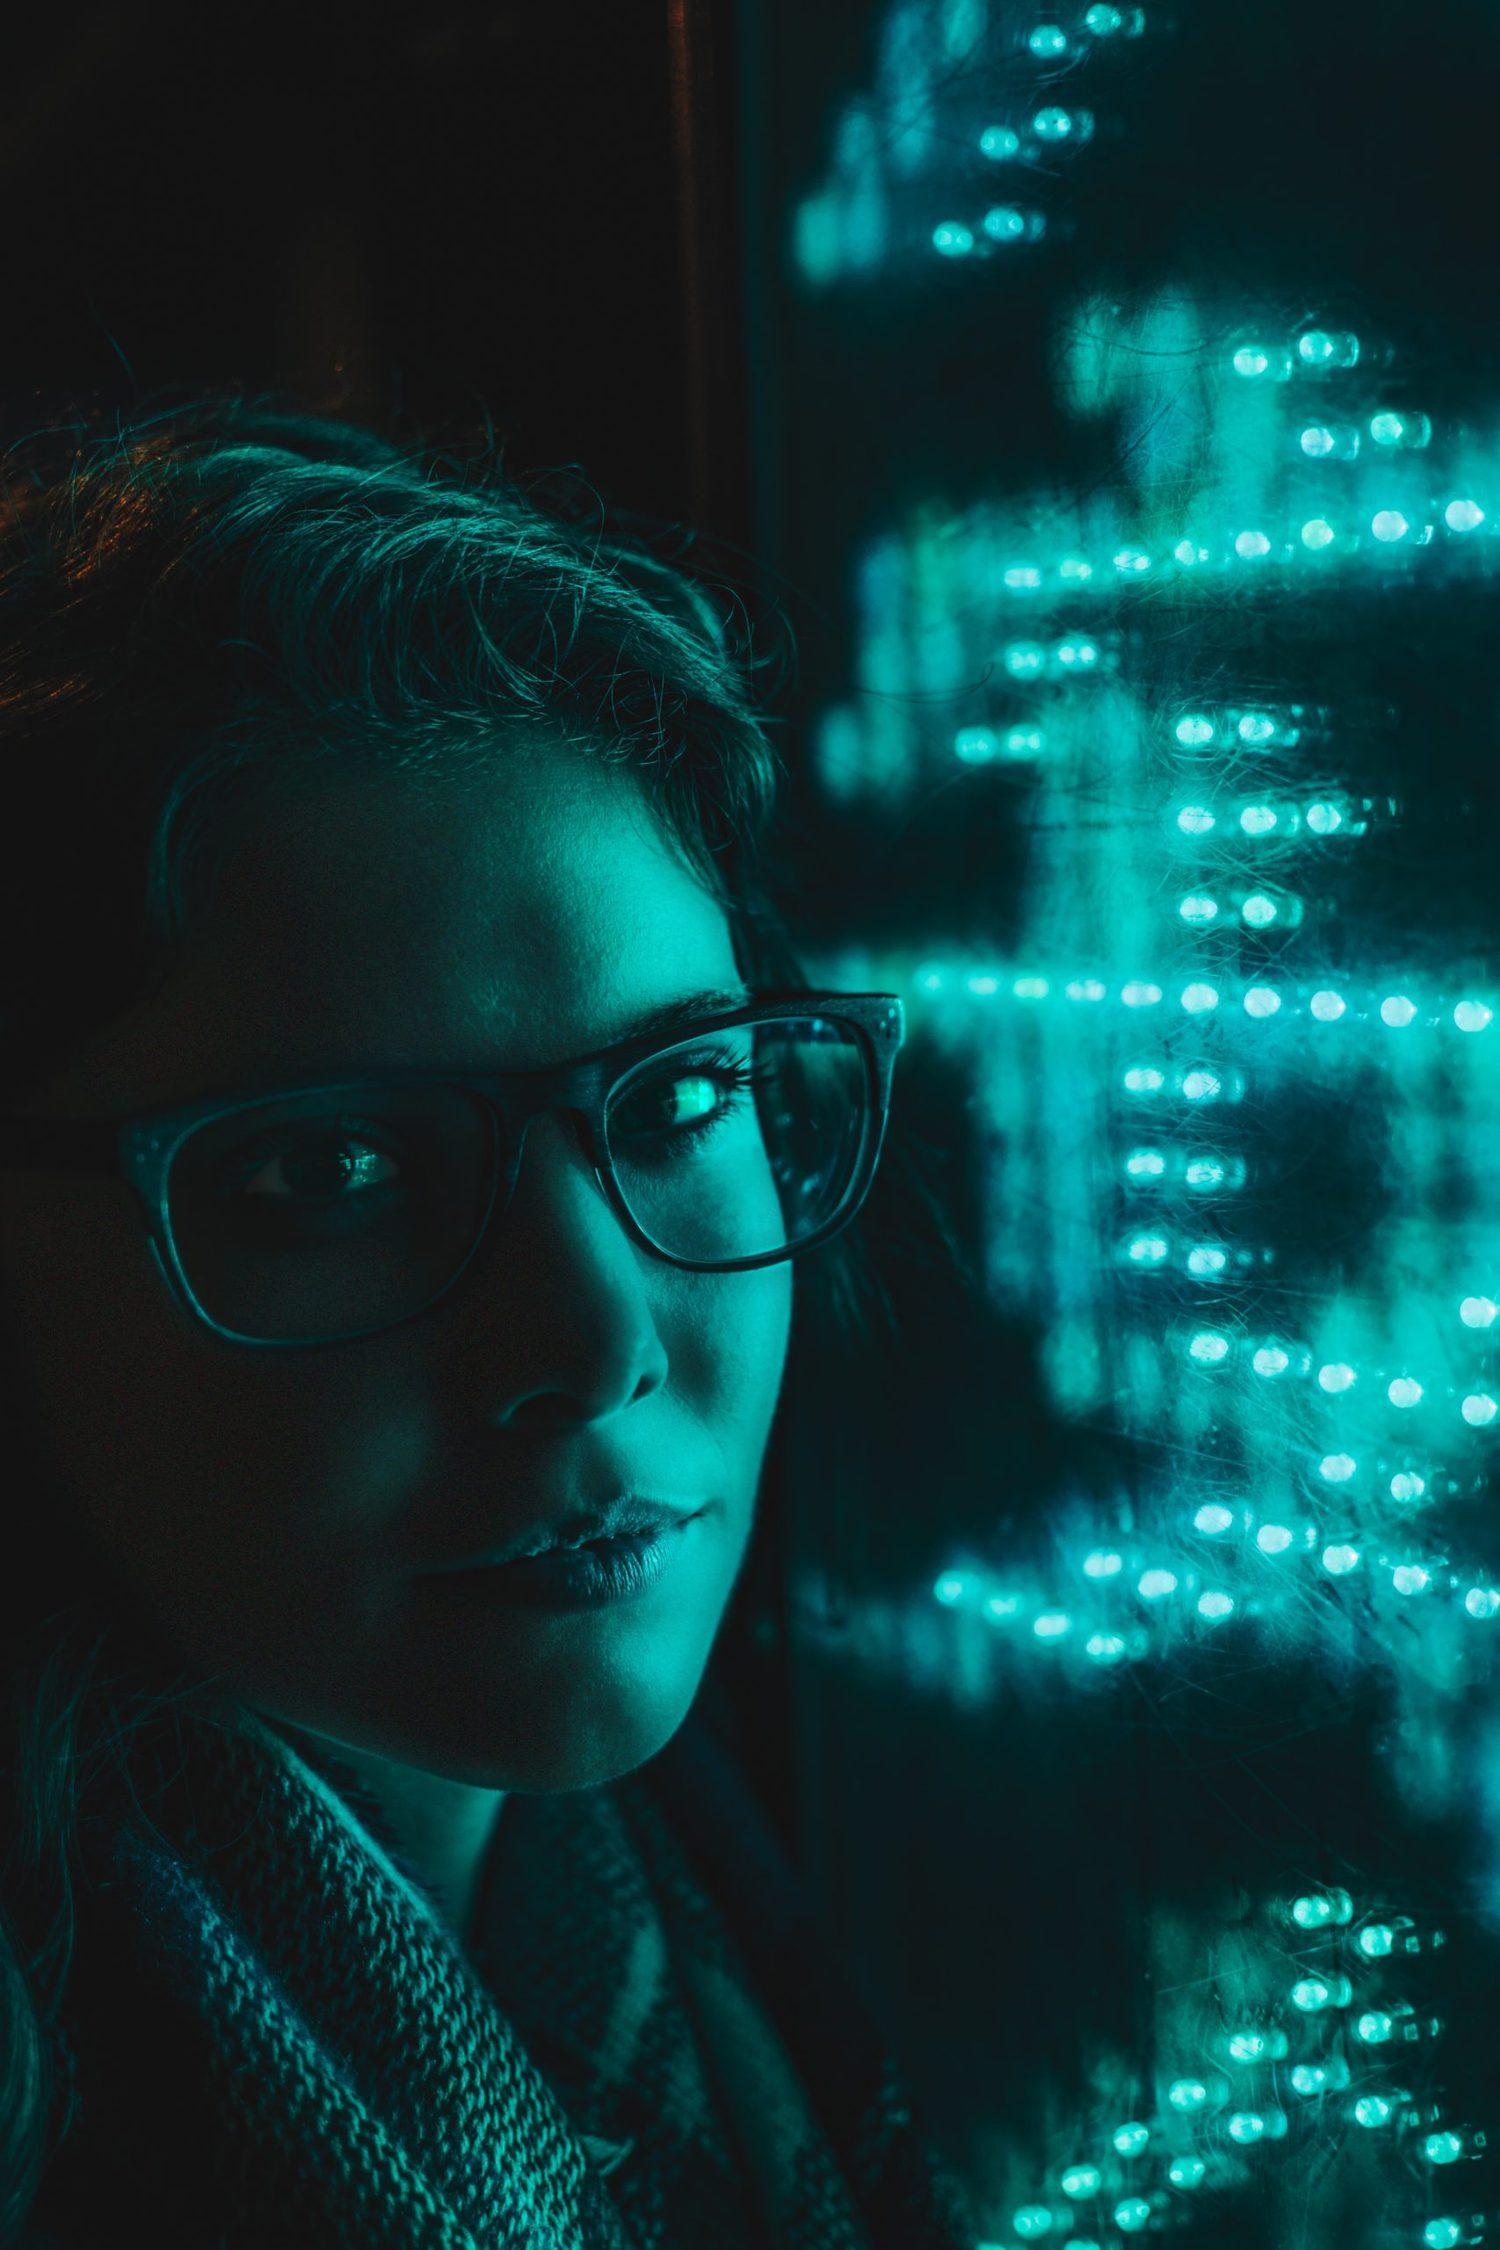 Chica con gafas en retrato con tonos fríos